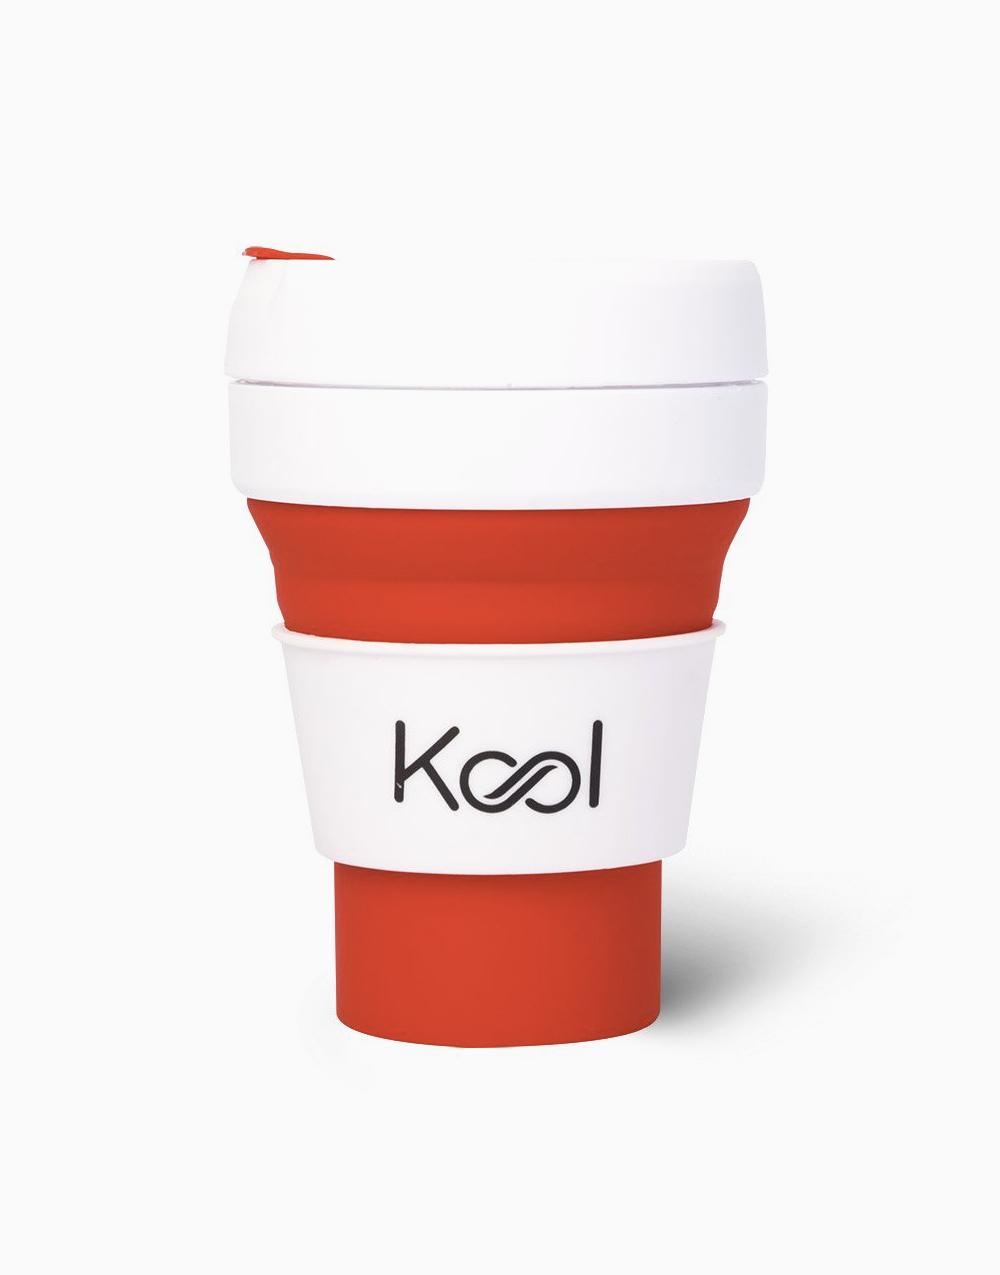 Kool Foldable Cup (355ml) by Kool | Lava